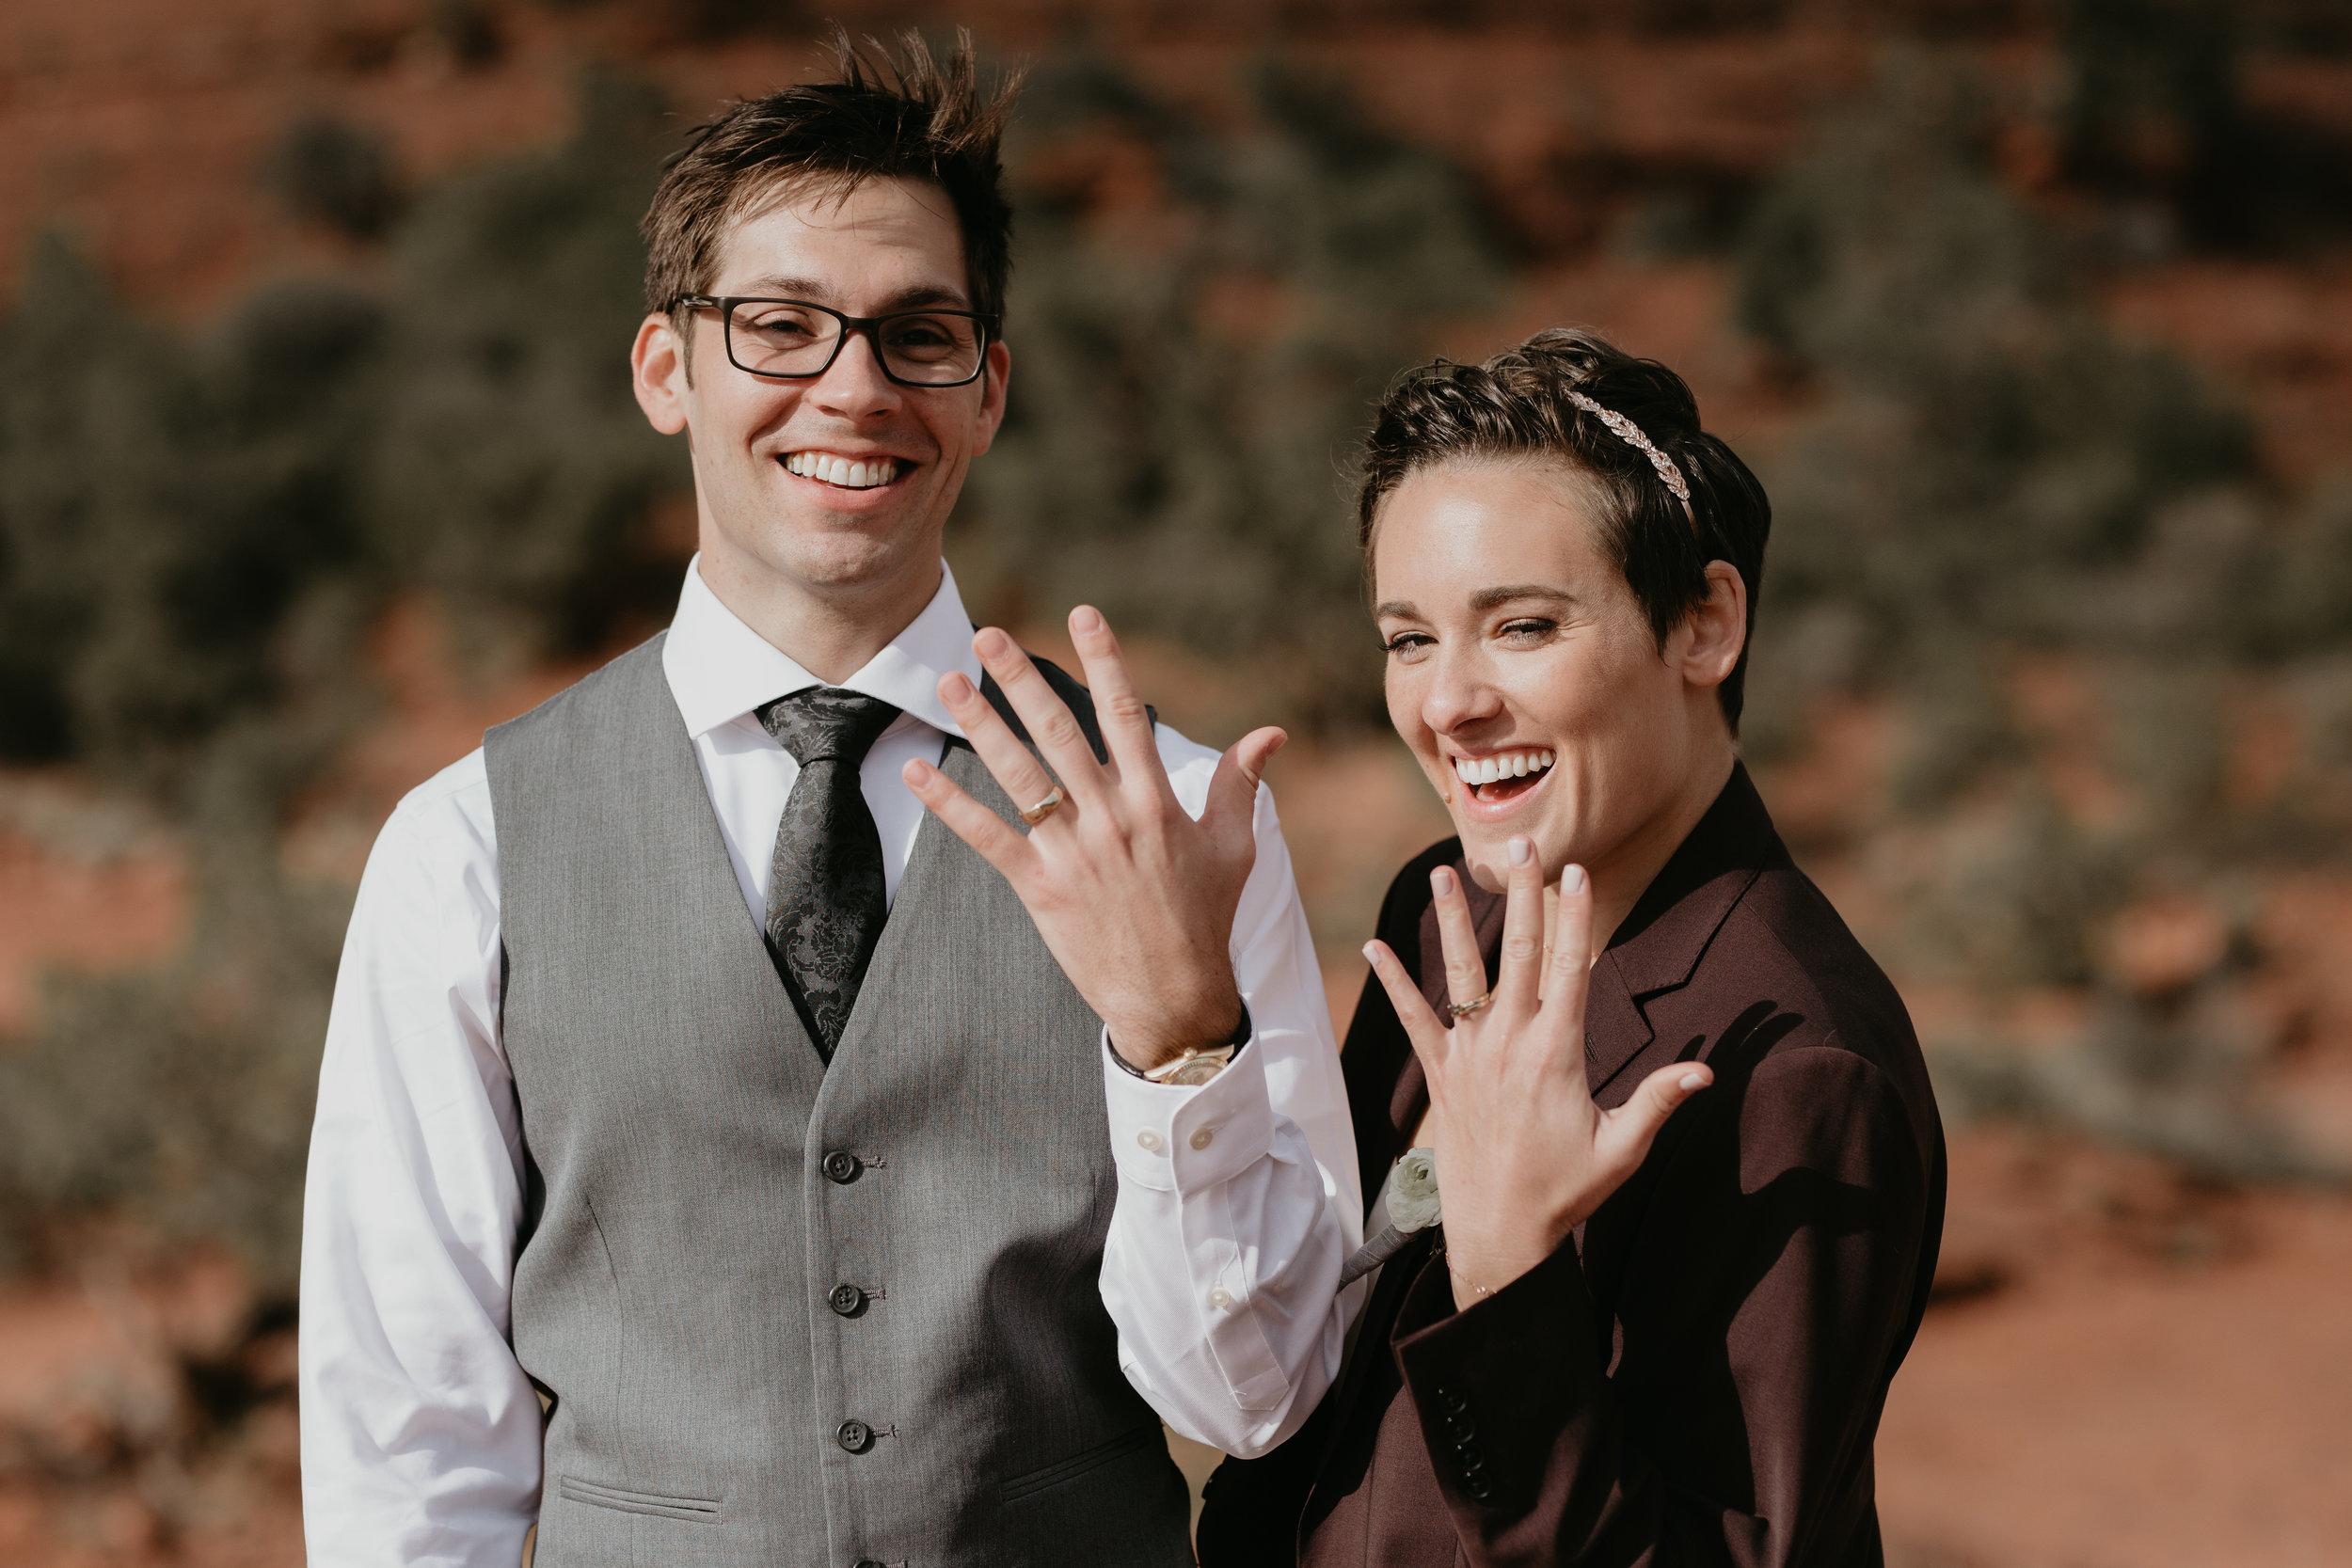 nicole-daacke-photography-sedona-arizona-destination-elopement-wedding-photographer-catherdral-rock-hiking-elopement-sedona-river-elopement-photos-desert-rock-wedding-photographer-laid-back-spontaneous-elopement-93.jpg